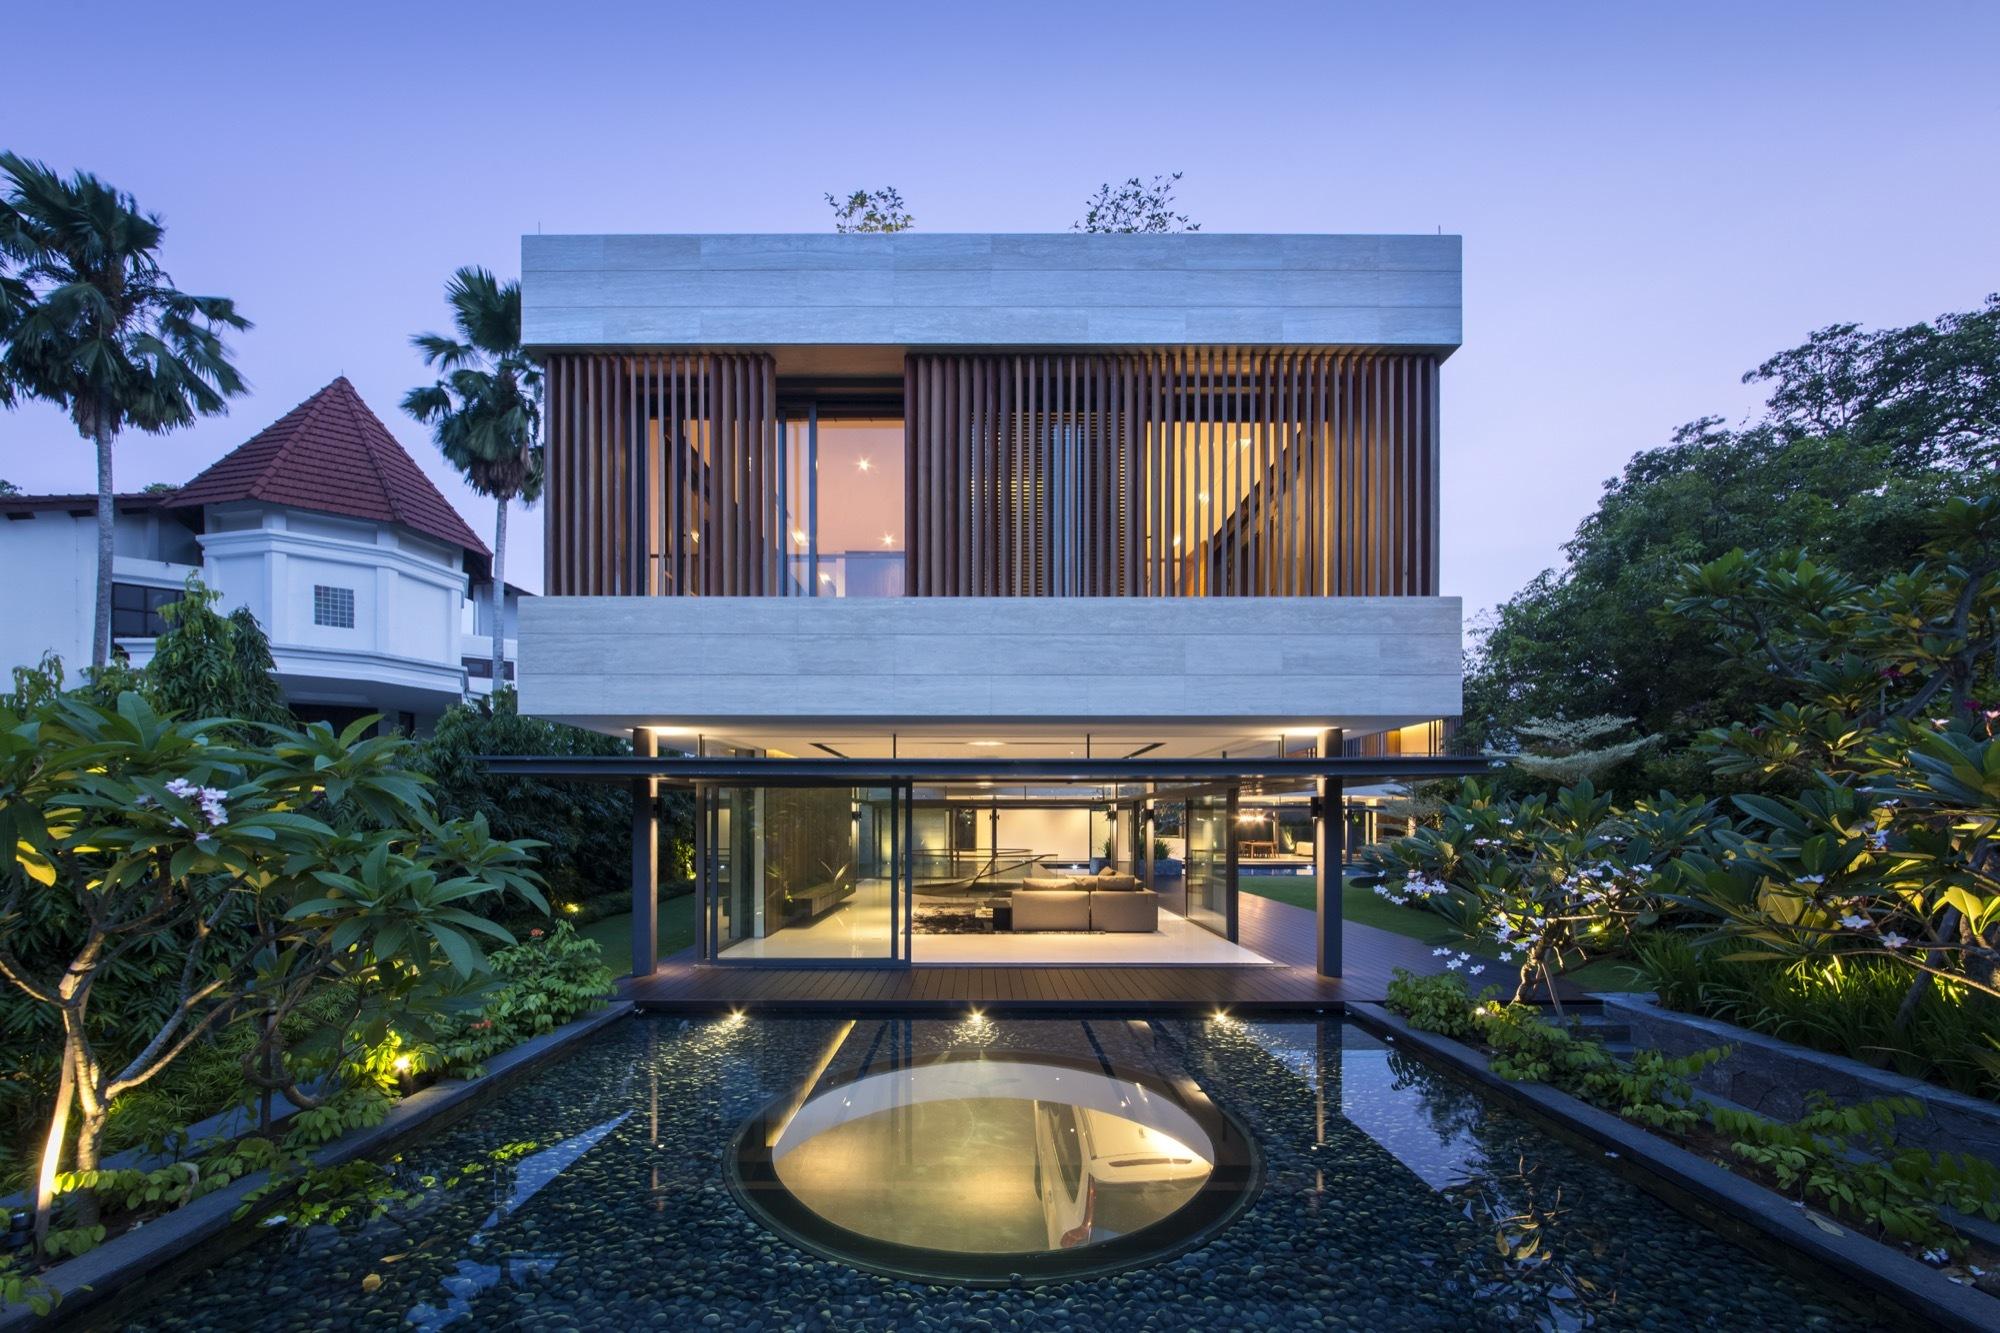 Garden And House Design : Secret garden house wallflower architecture design